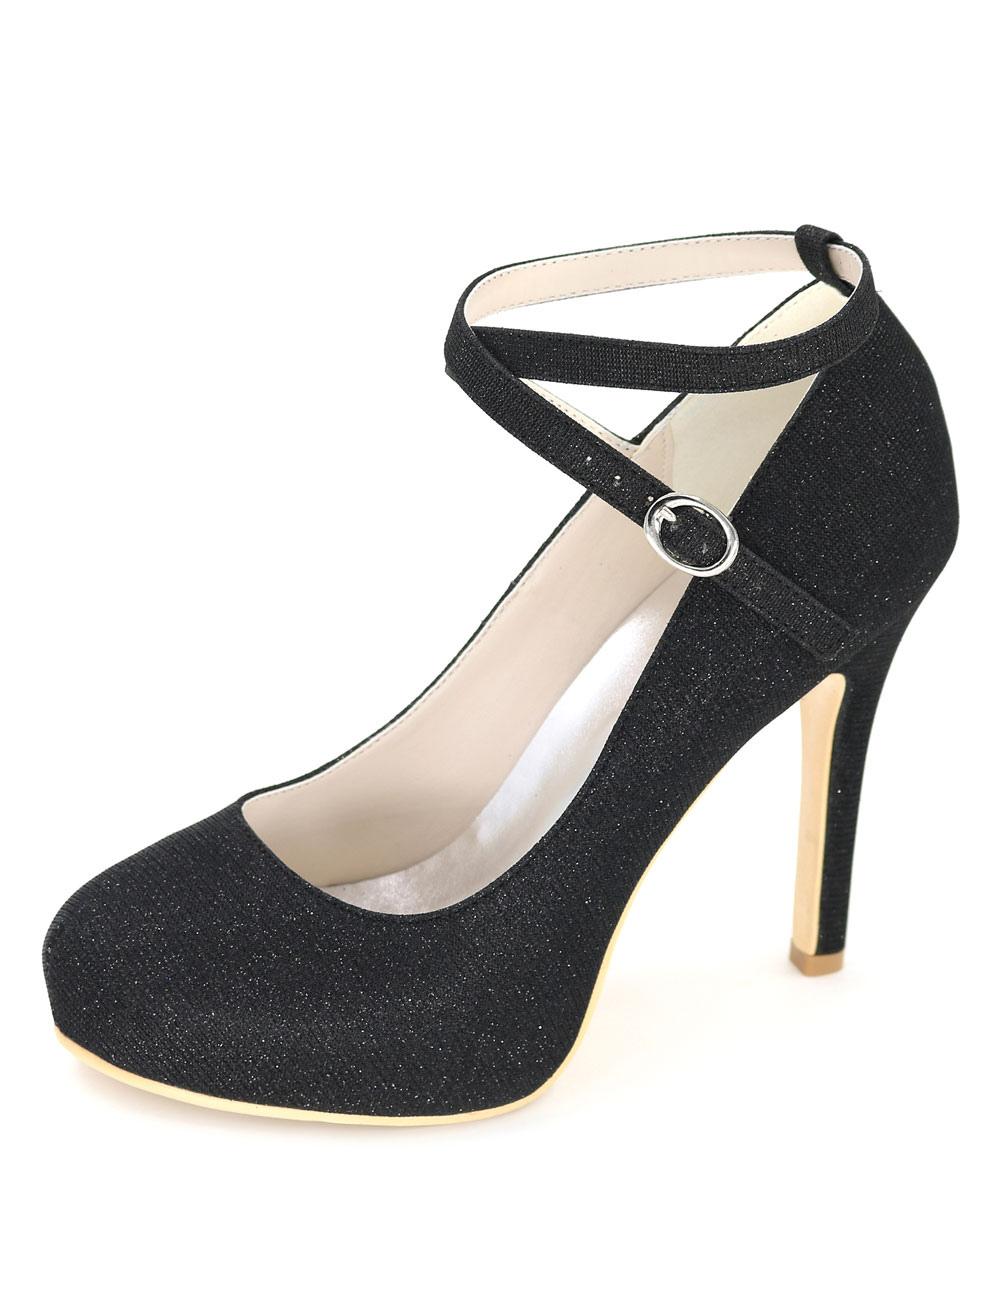 34633391693d Black Wedding Shoes Platform High Heels Glitter Women's Ankle Strap Stiletto  Bridal Shoes-No. 12. 30%OFF. Color:Black